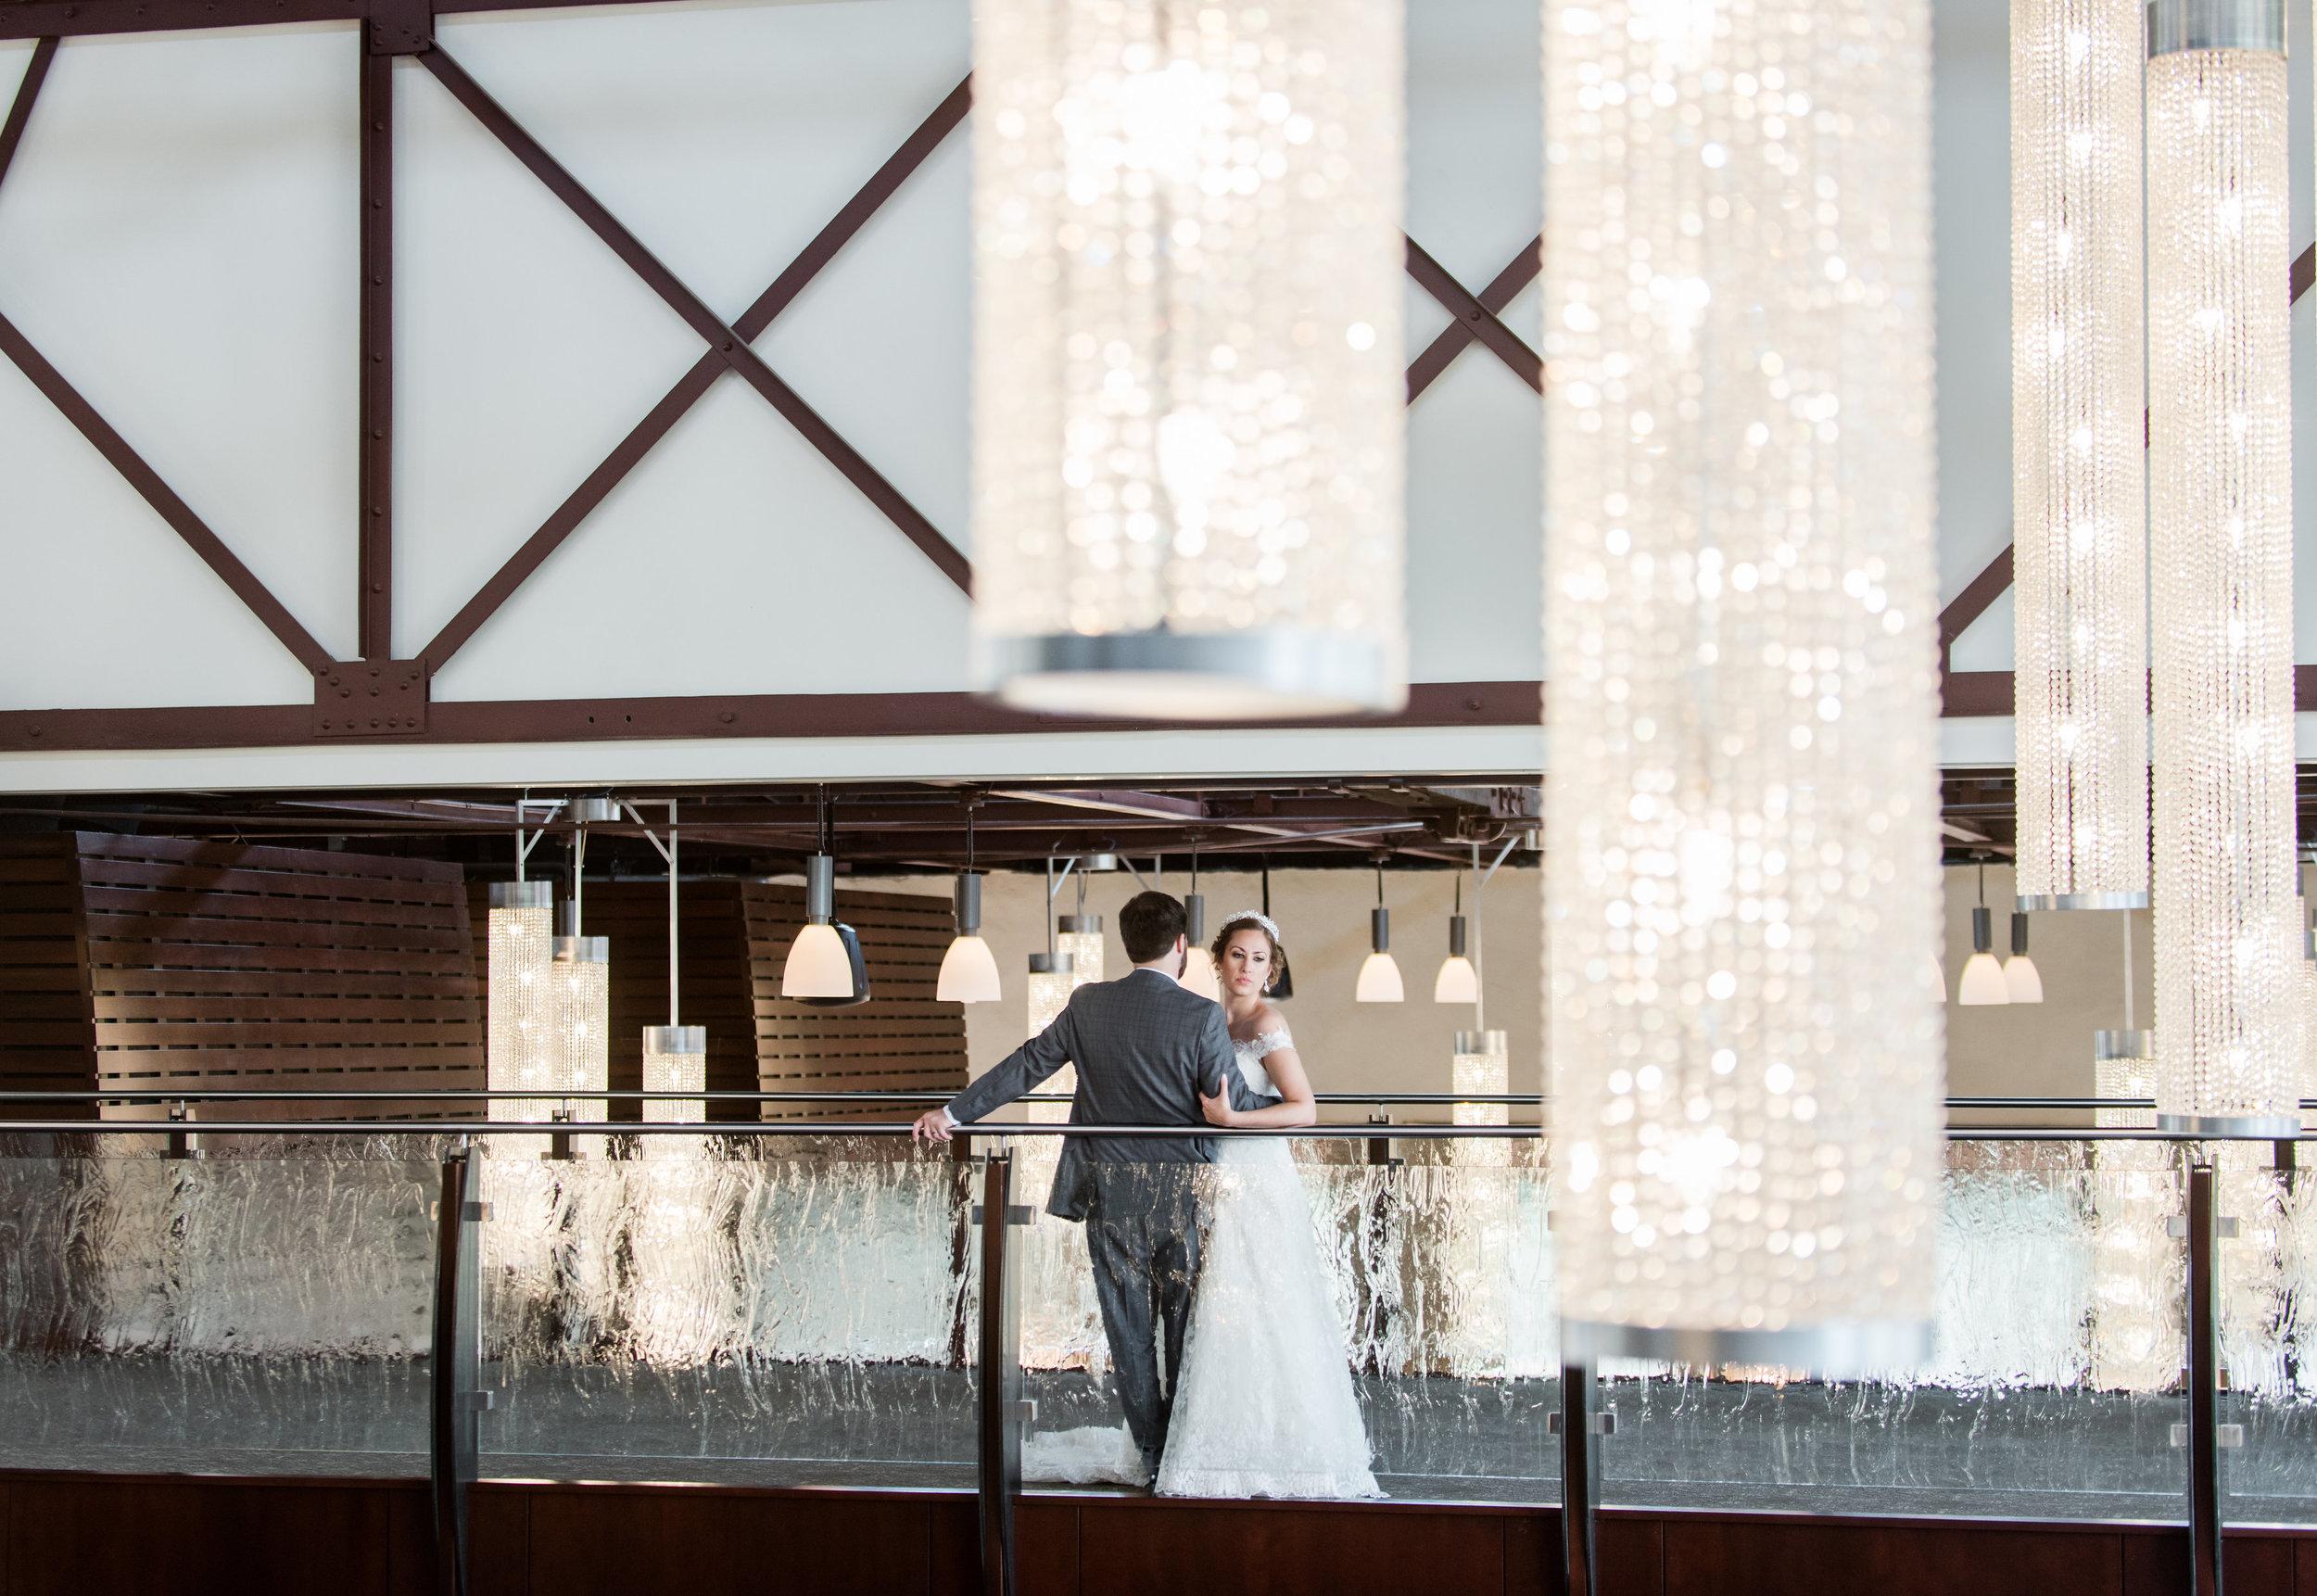 Wedding-Photographer-The-Foundry-Pheonixville-Pennsylvania-Andrea-Krout-Photography-195.jpg